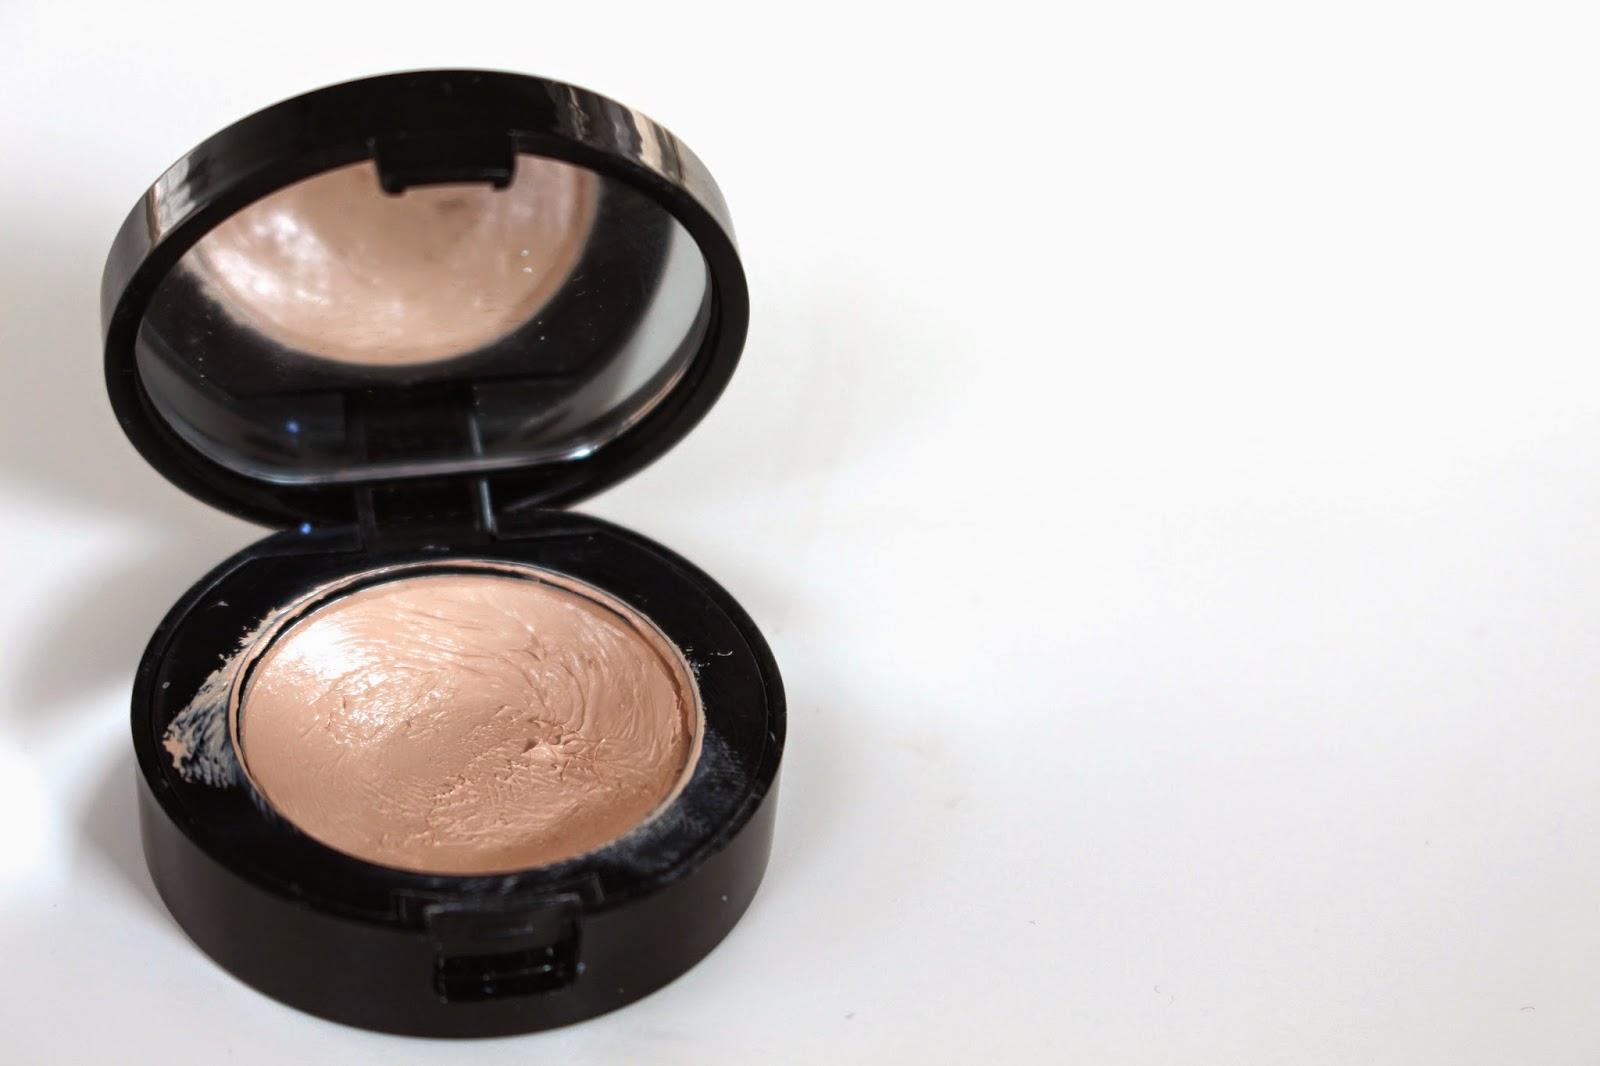 Bobbi Brown Creamy Concealer Review